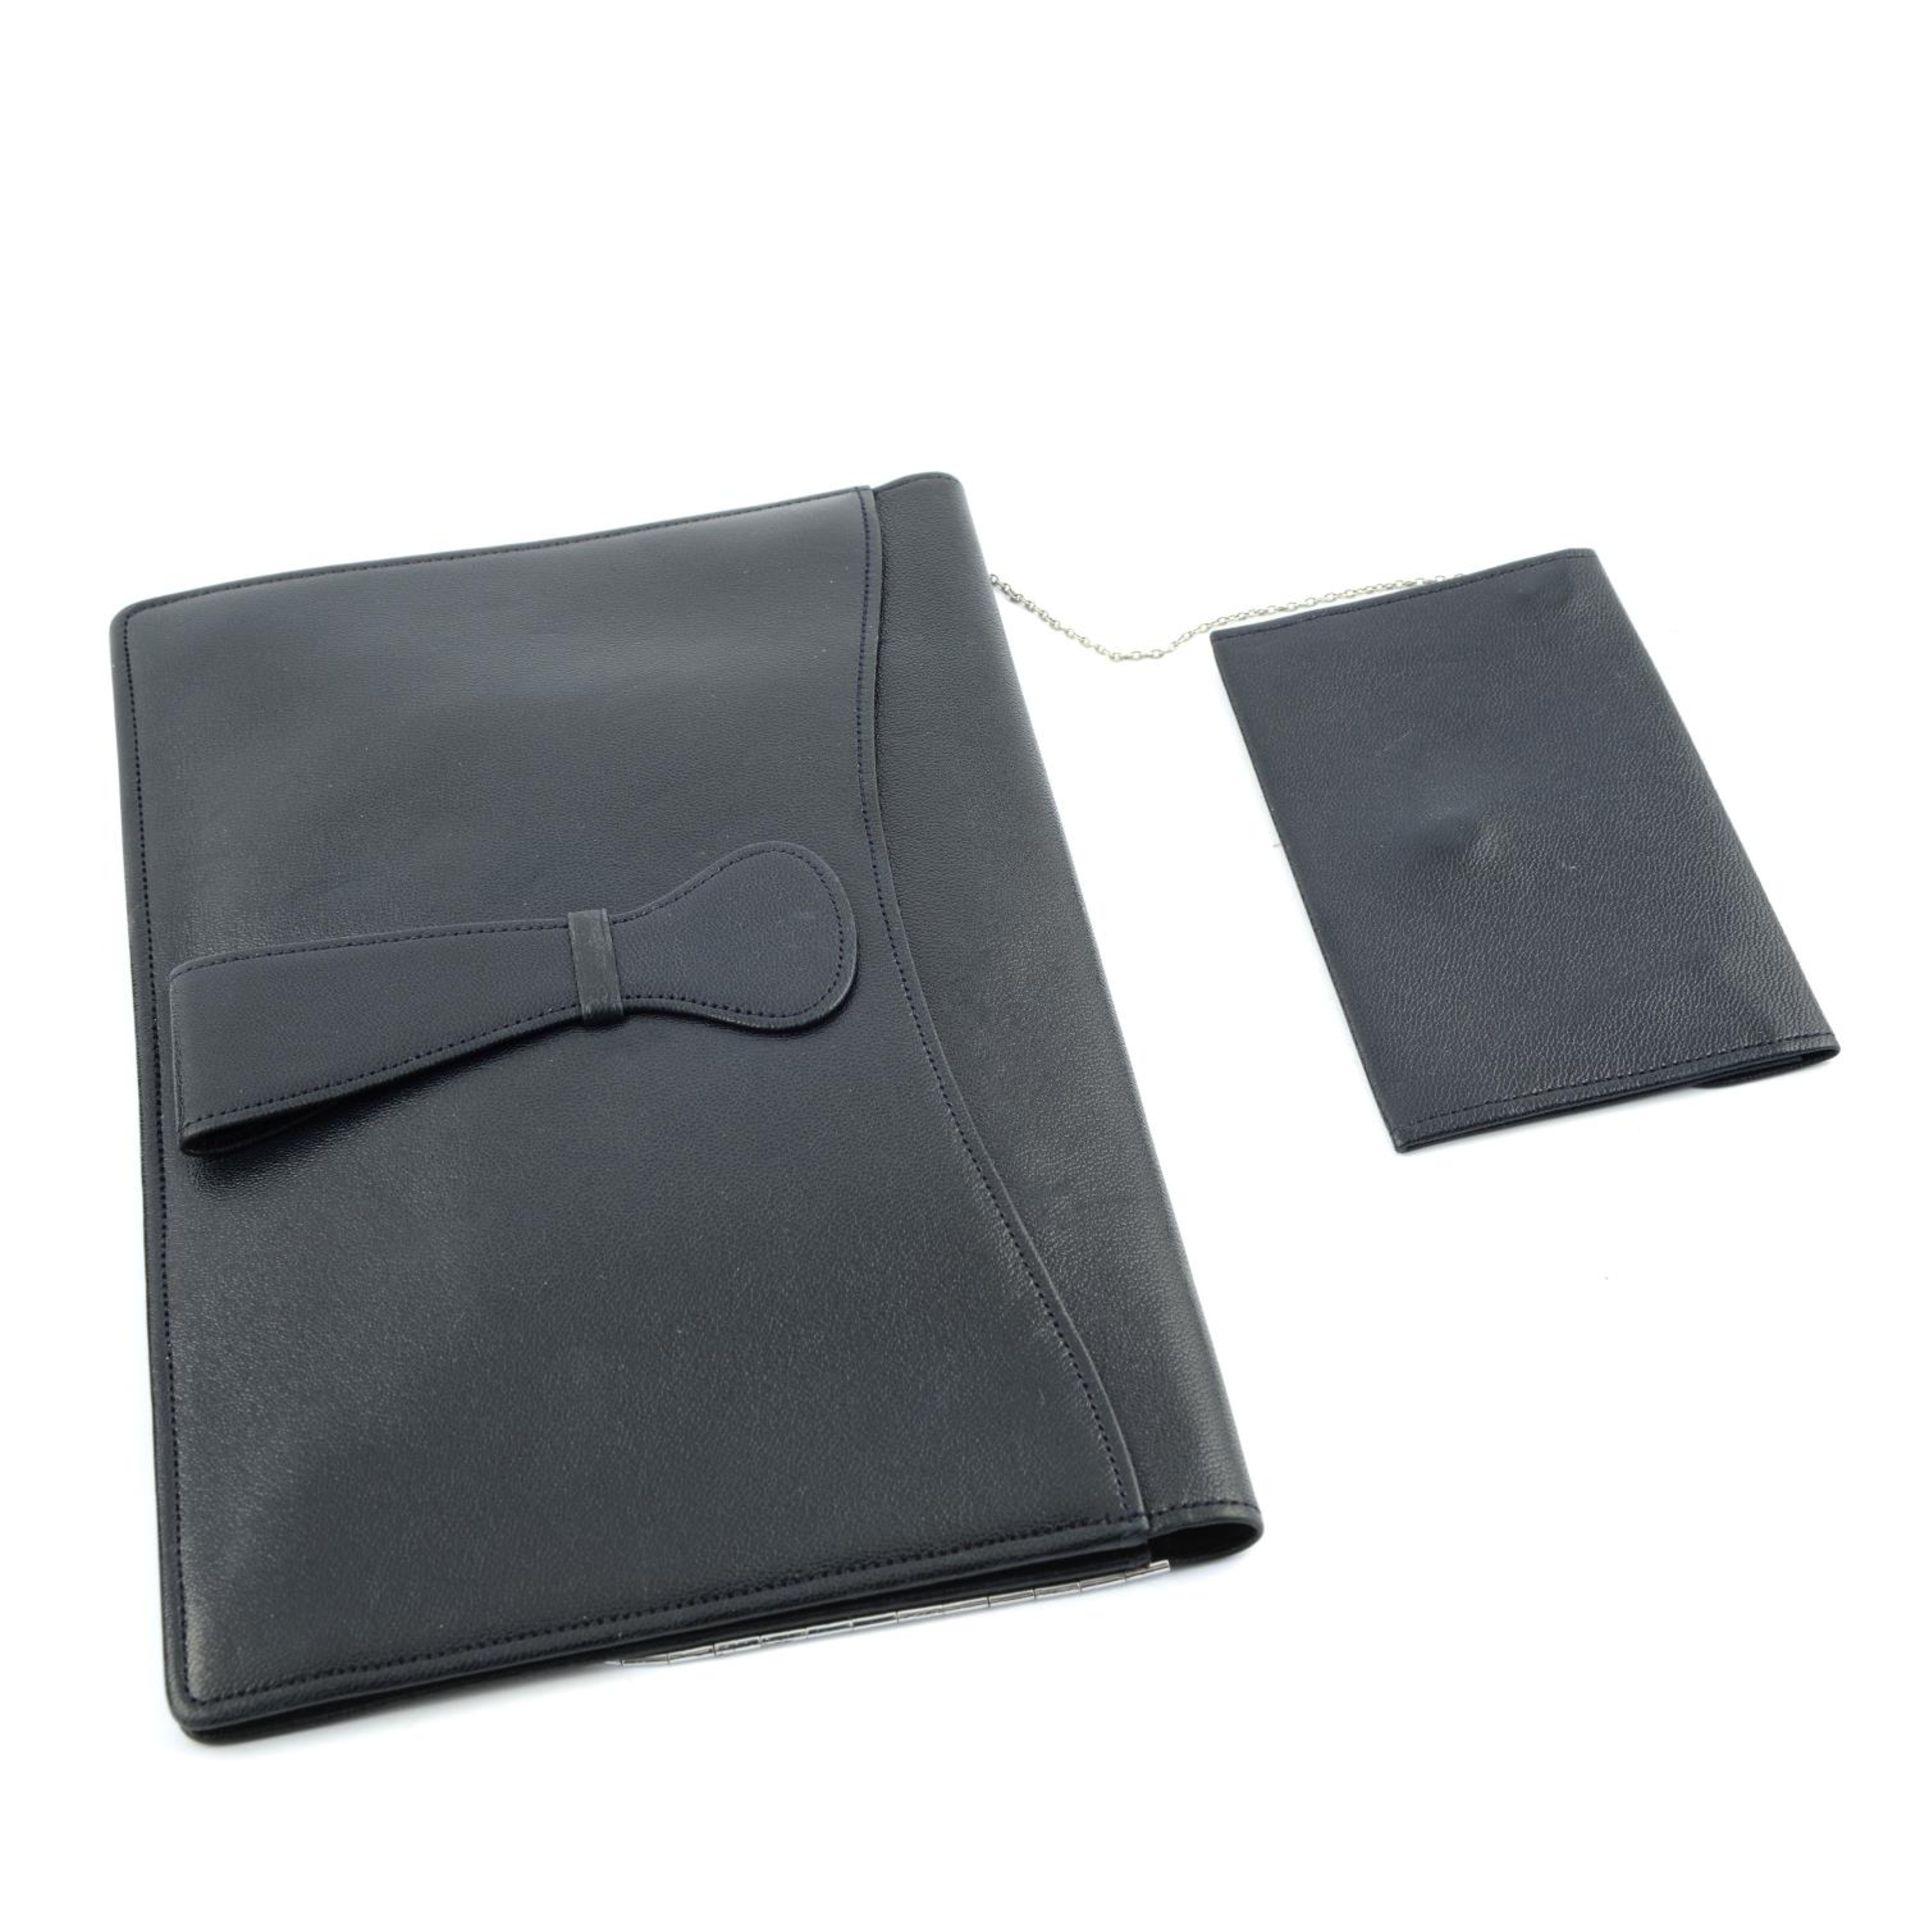 ASPREY - a vintage leather clutch. - Image 3 of 3